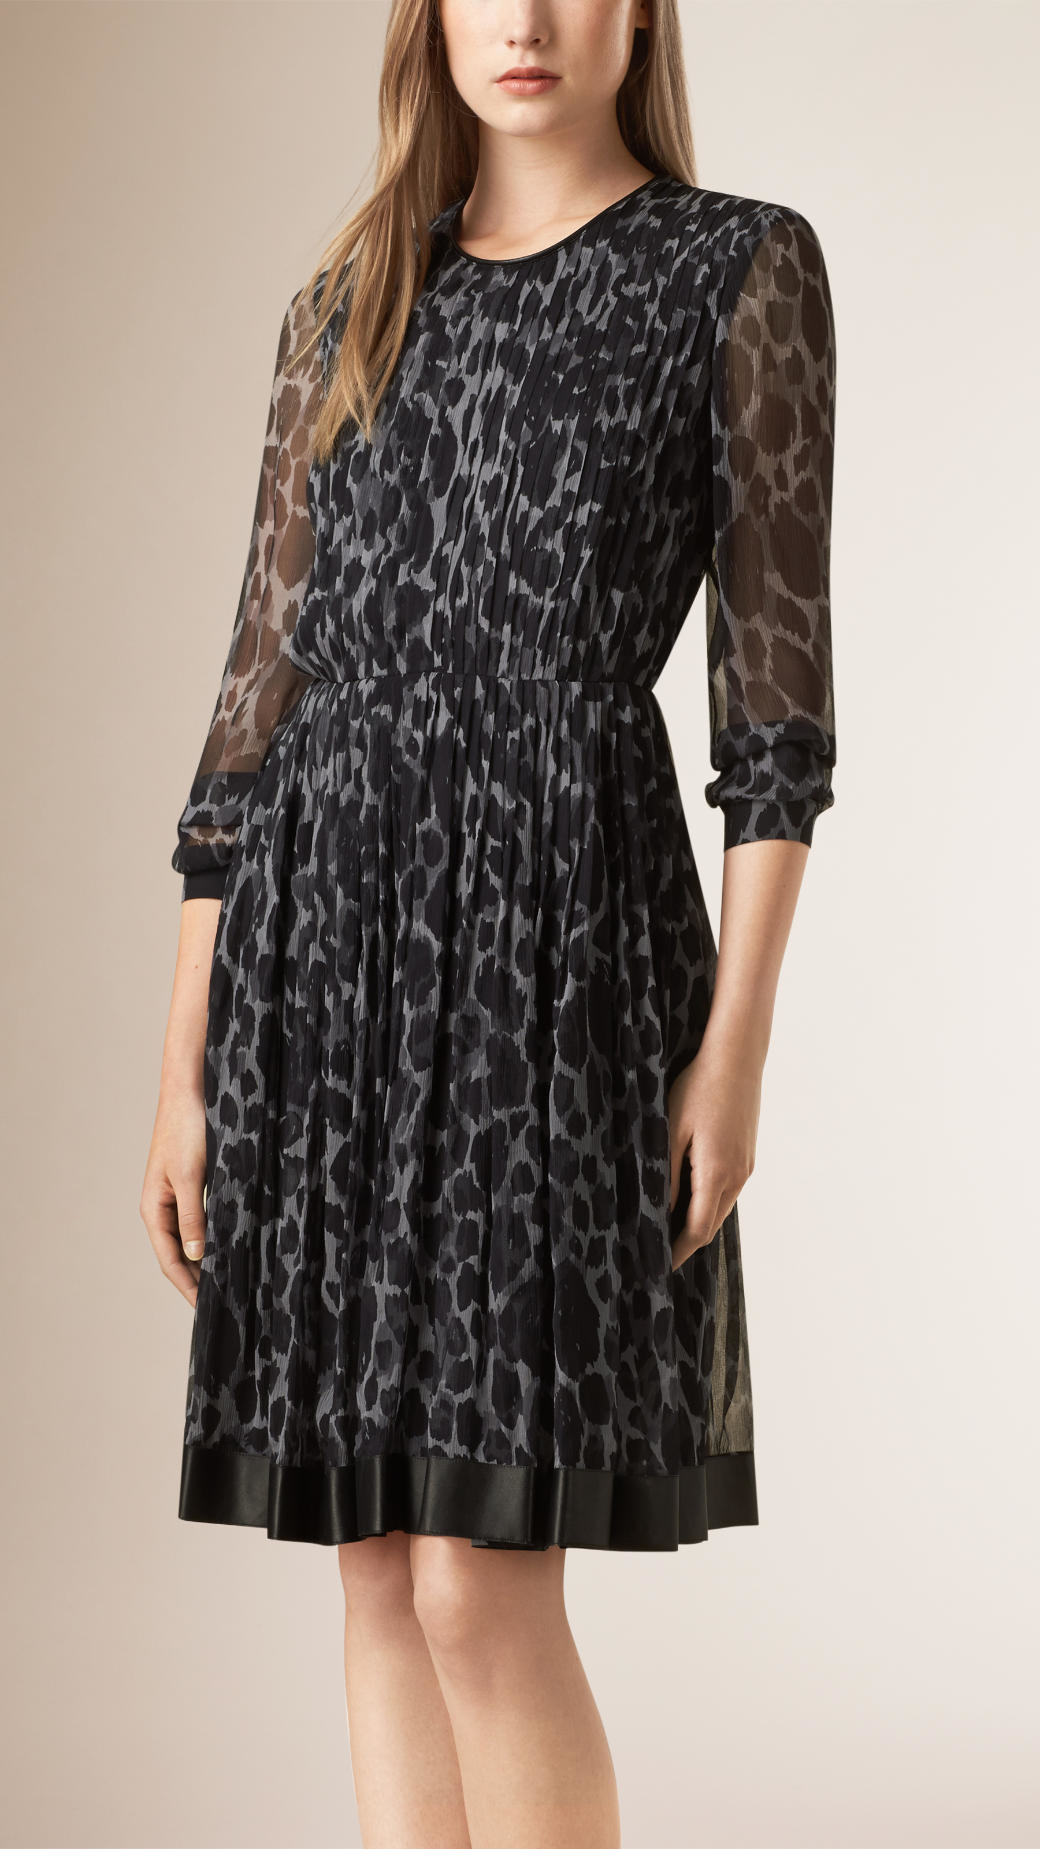 f863f7d1618c6 Burberry Animal-Print Silk Dress in Gray - Lyst